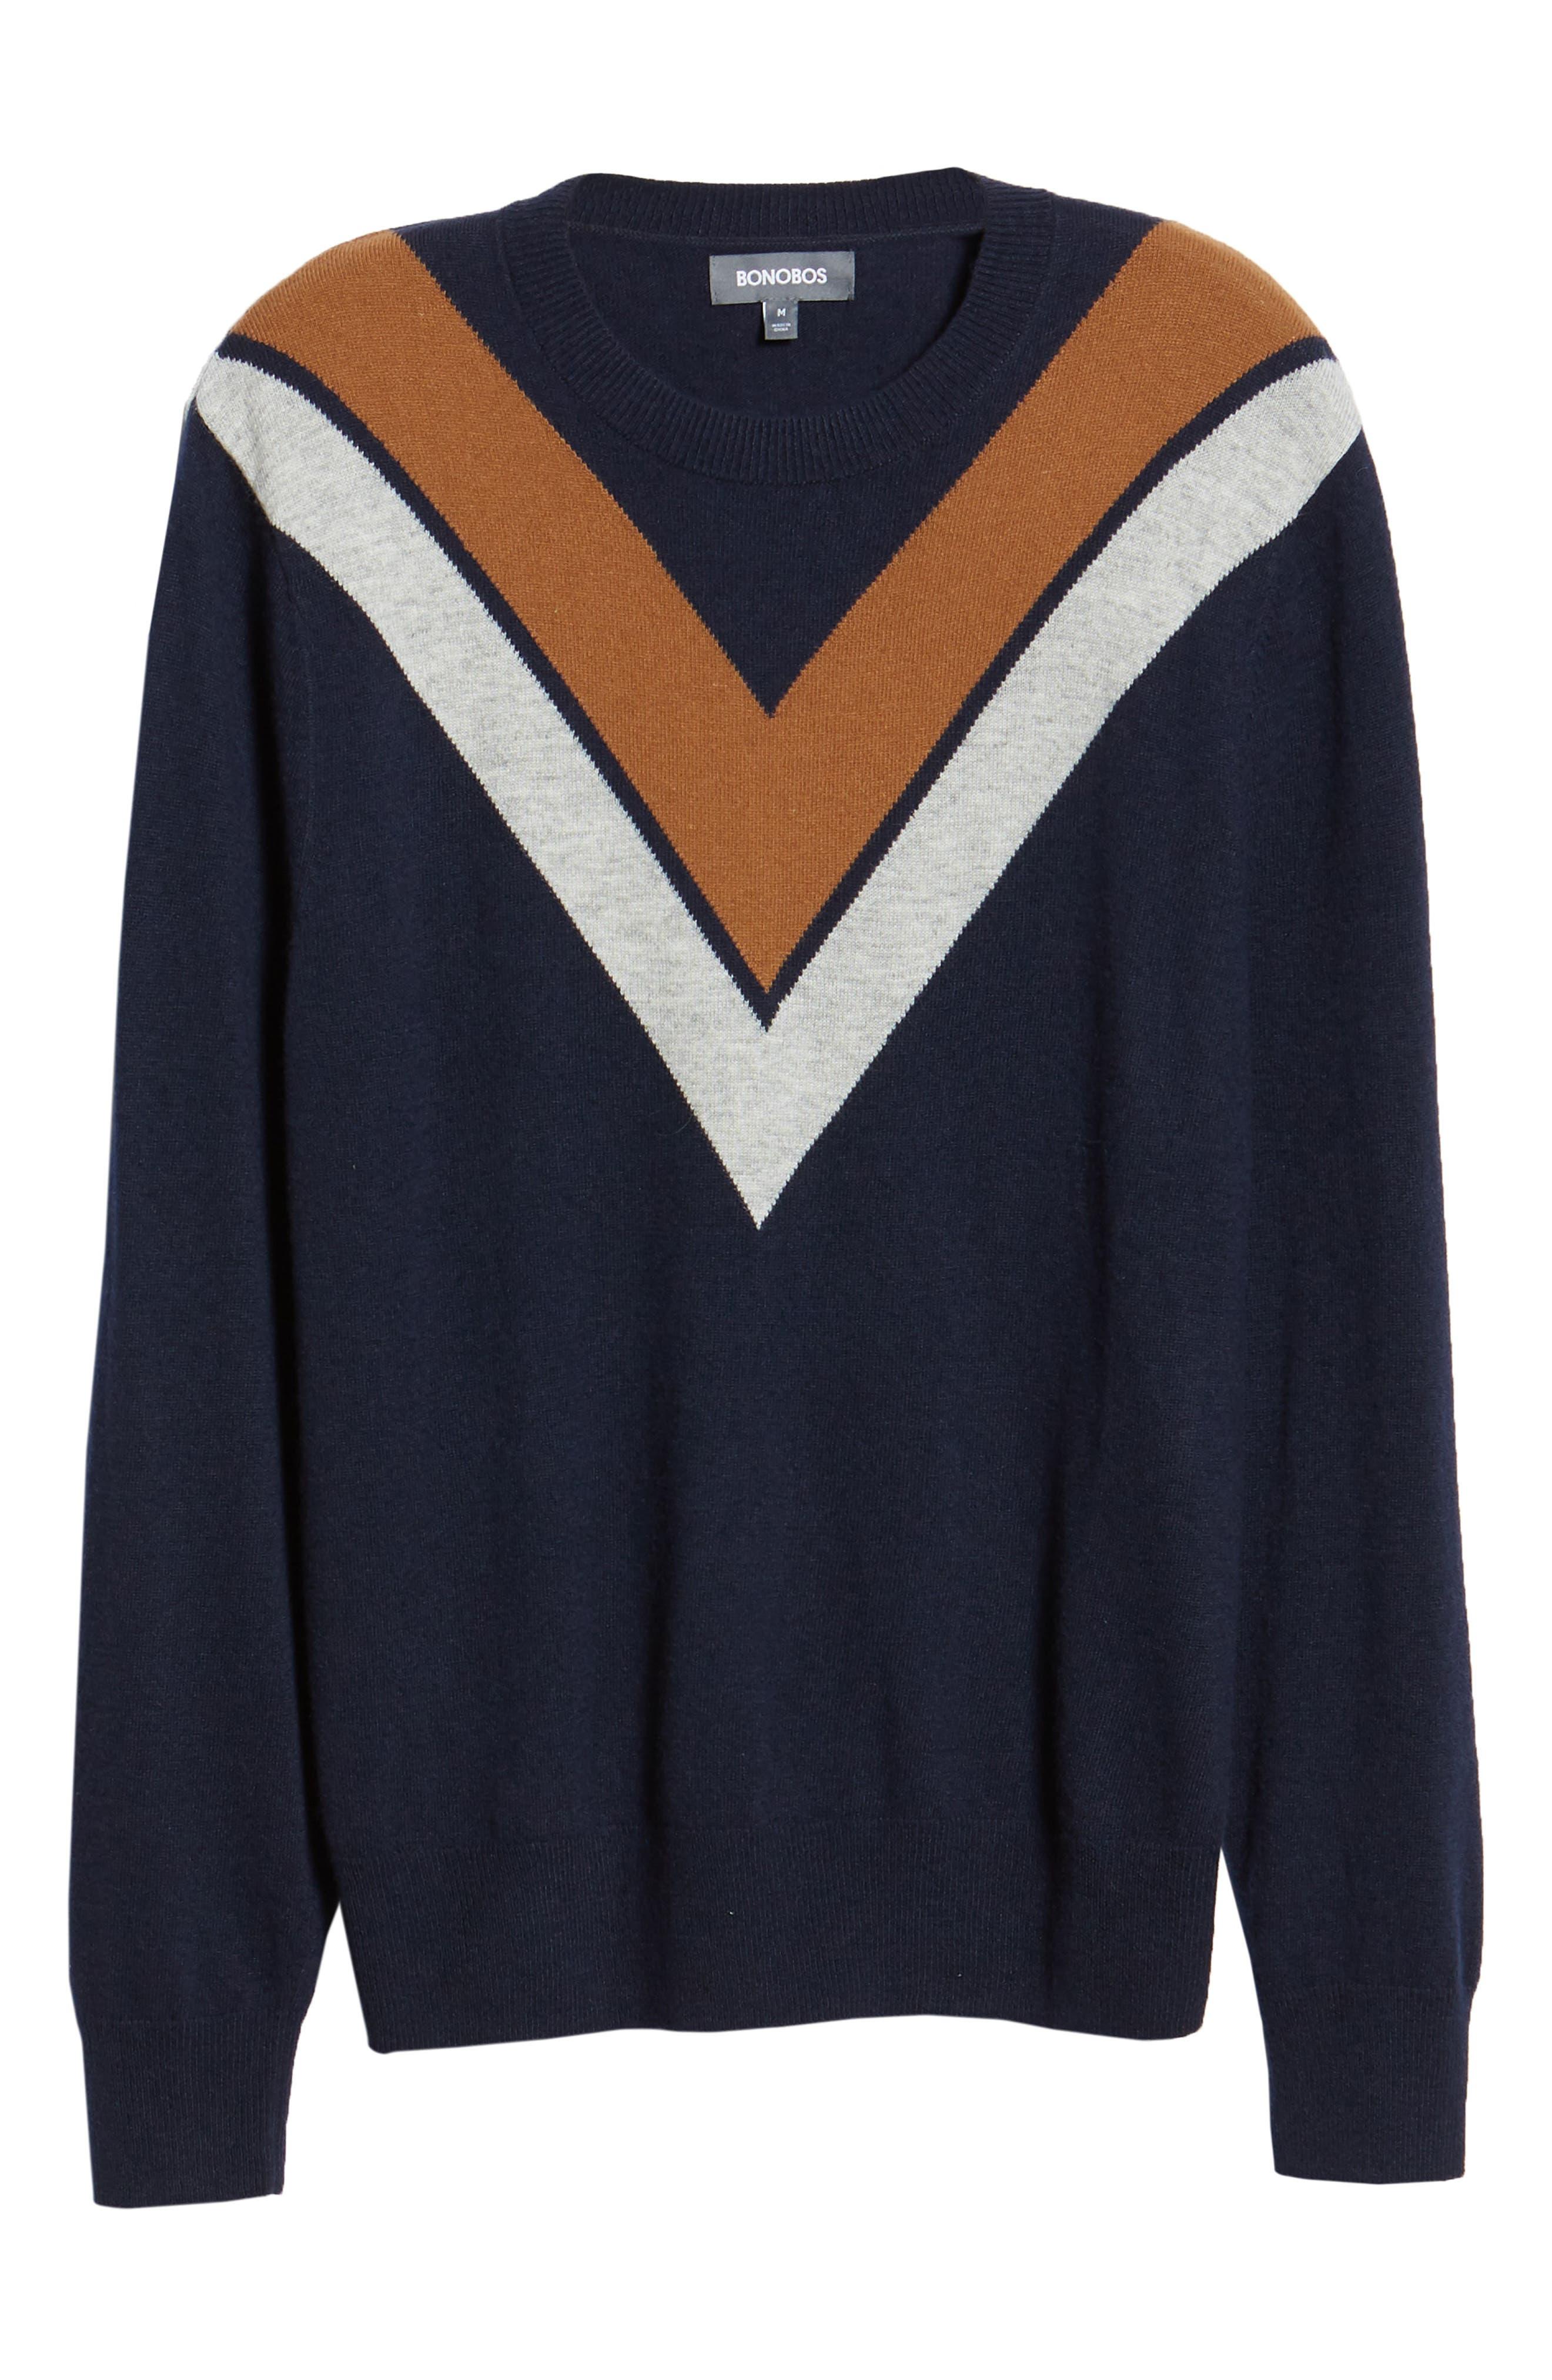 Minton V Crewneck Sweater,                             Alternate thumbnail 6, color,                             DARK NAVY/ LHN/ BURNT SUGAR